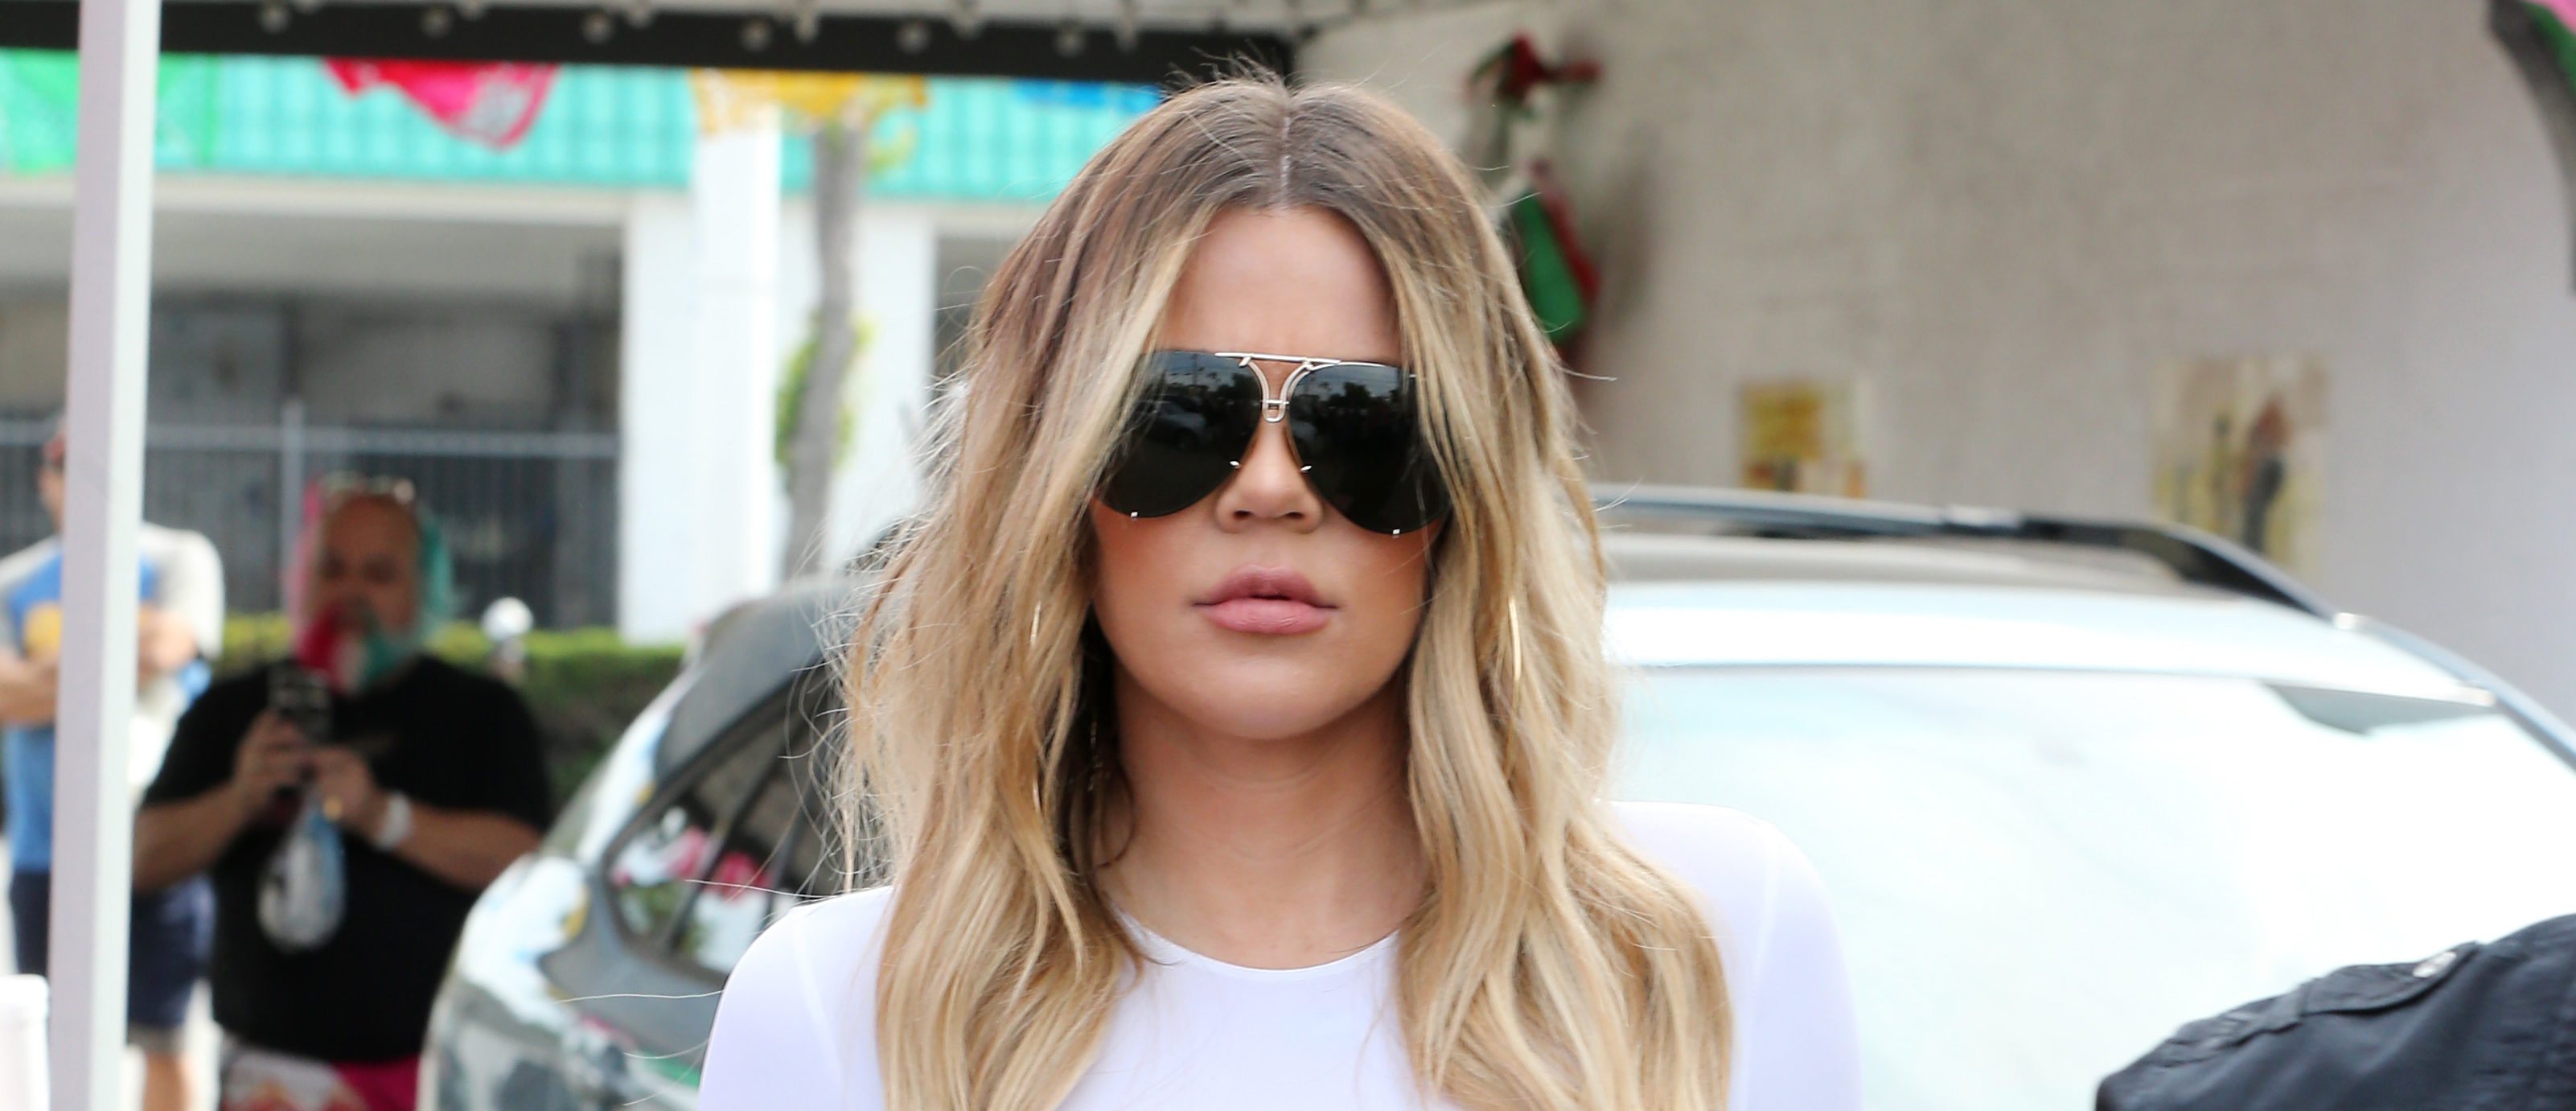 Khloe Kardashian (Photo credit: Splash News)